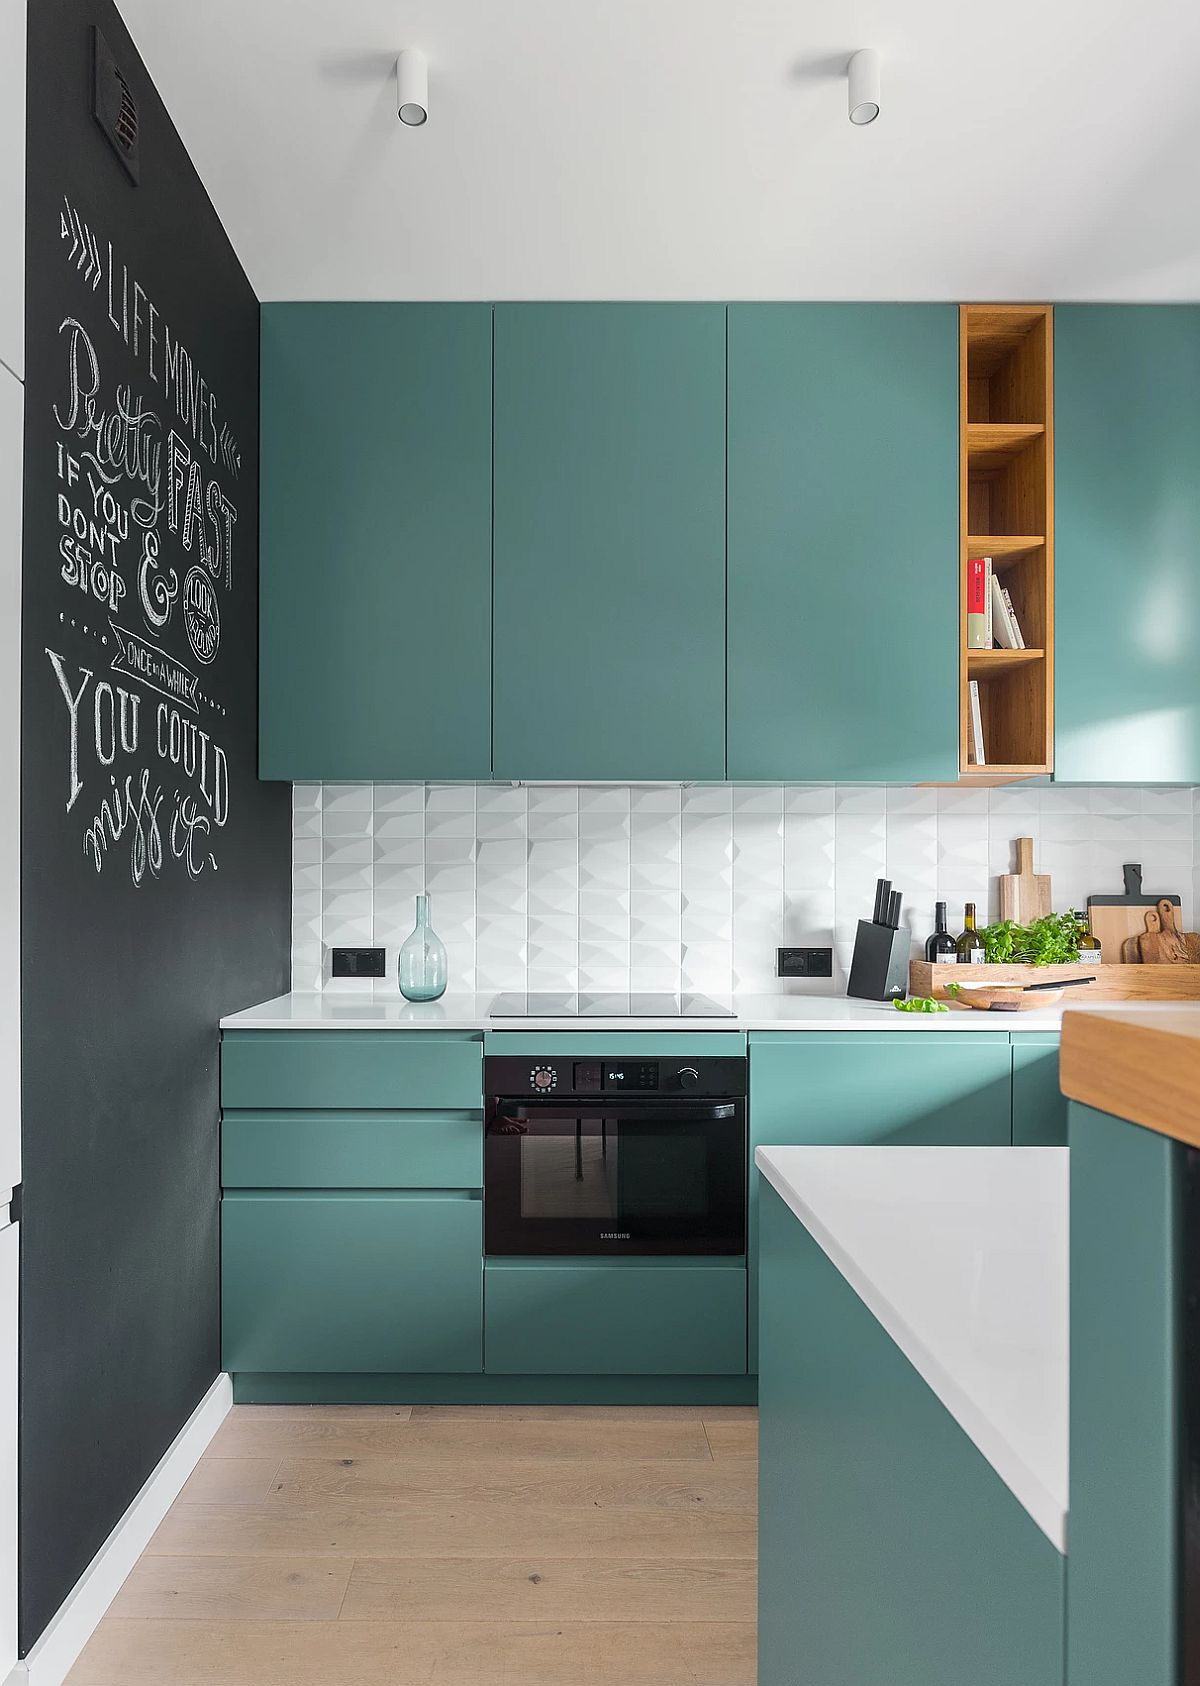 adelaparvu.com despre apartament 65 mp in culori de turcoaz, design 101wnetrz, Foto Pion Poziom (17)